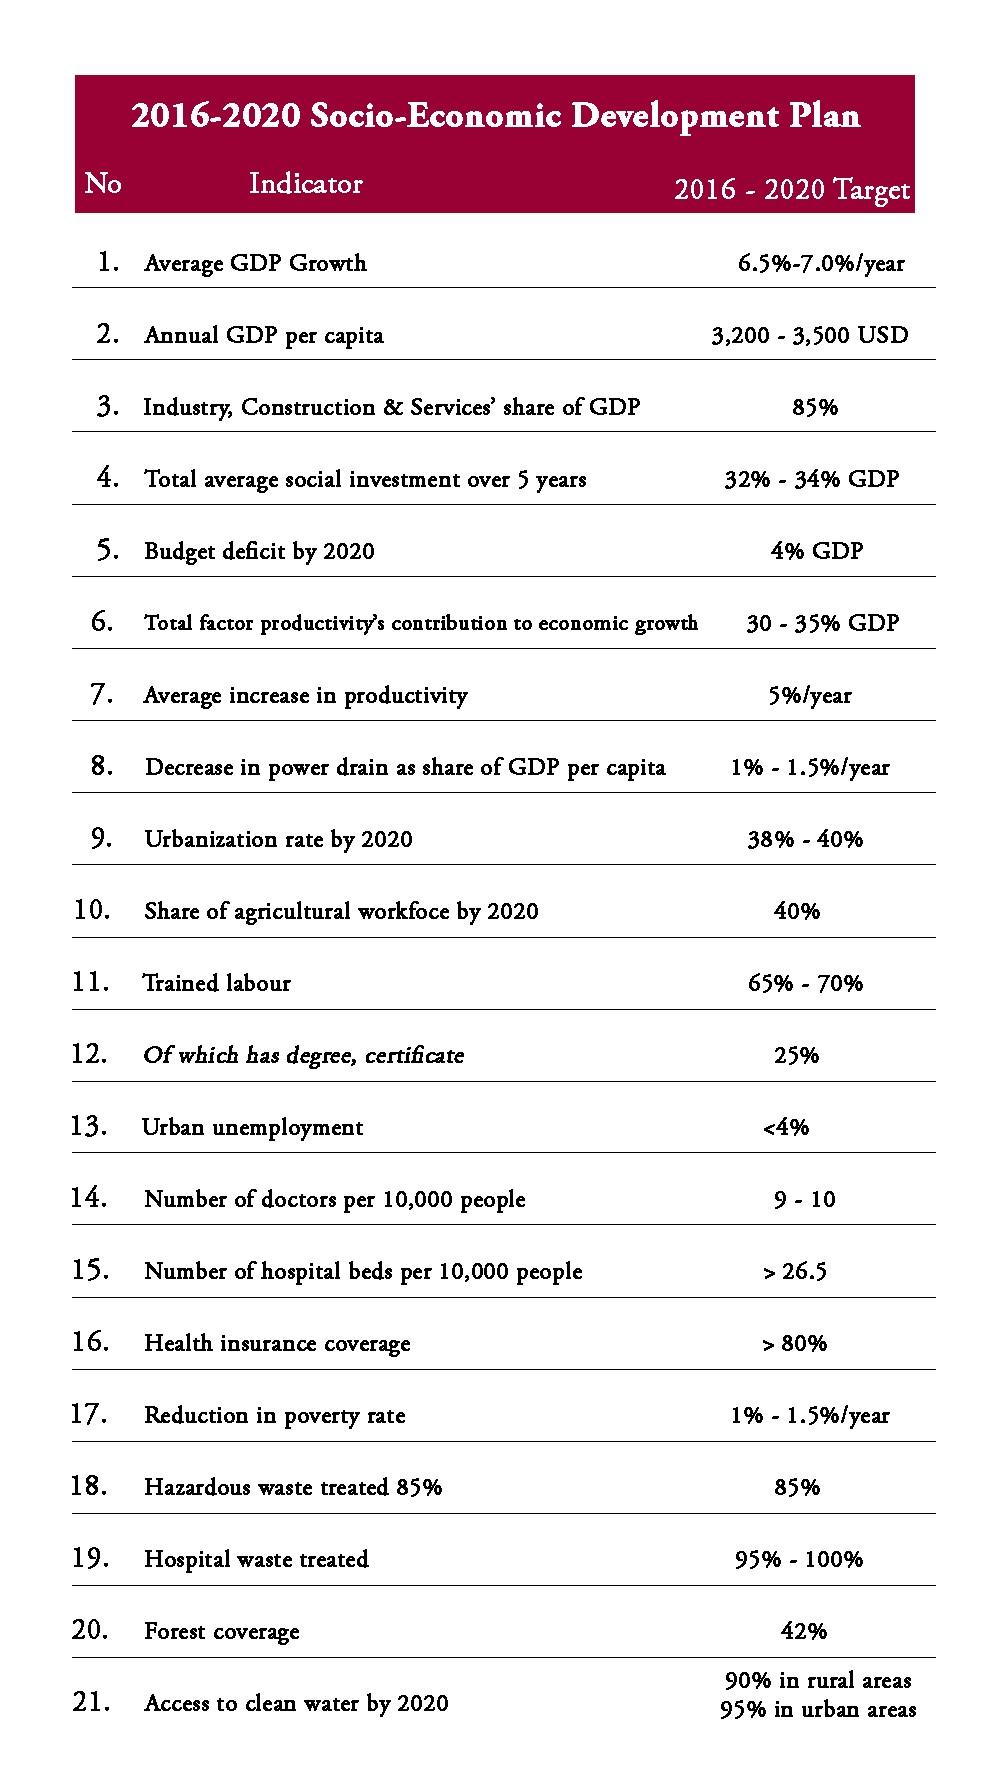 Factbox: Socio-economic development targets for 2016-2020